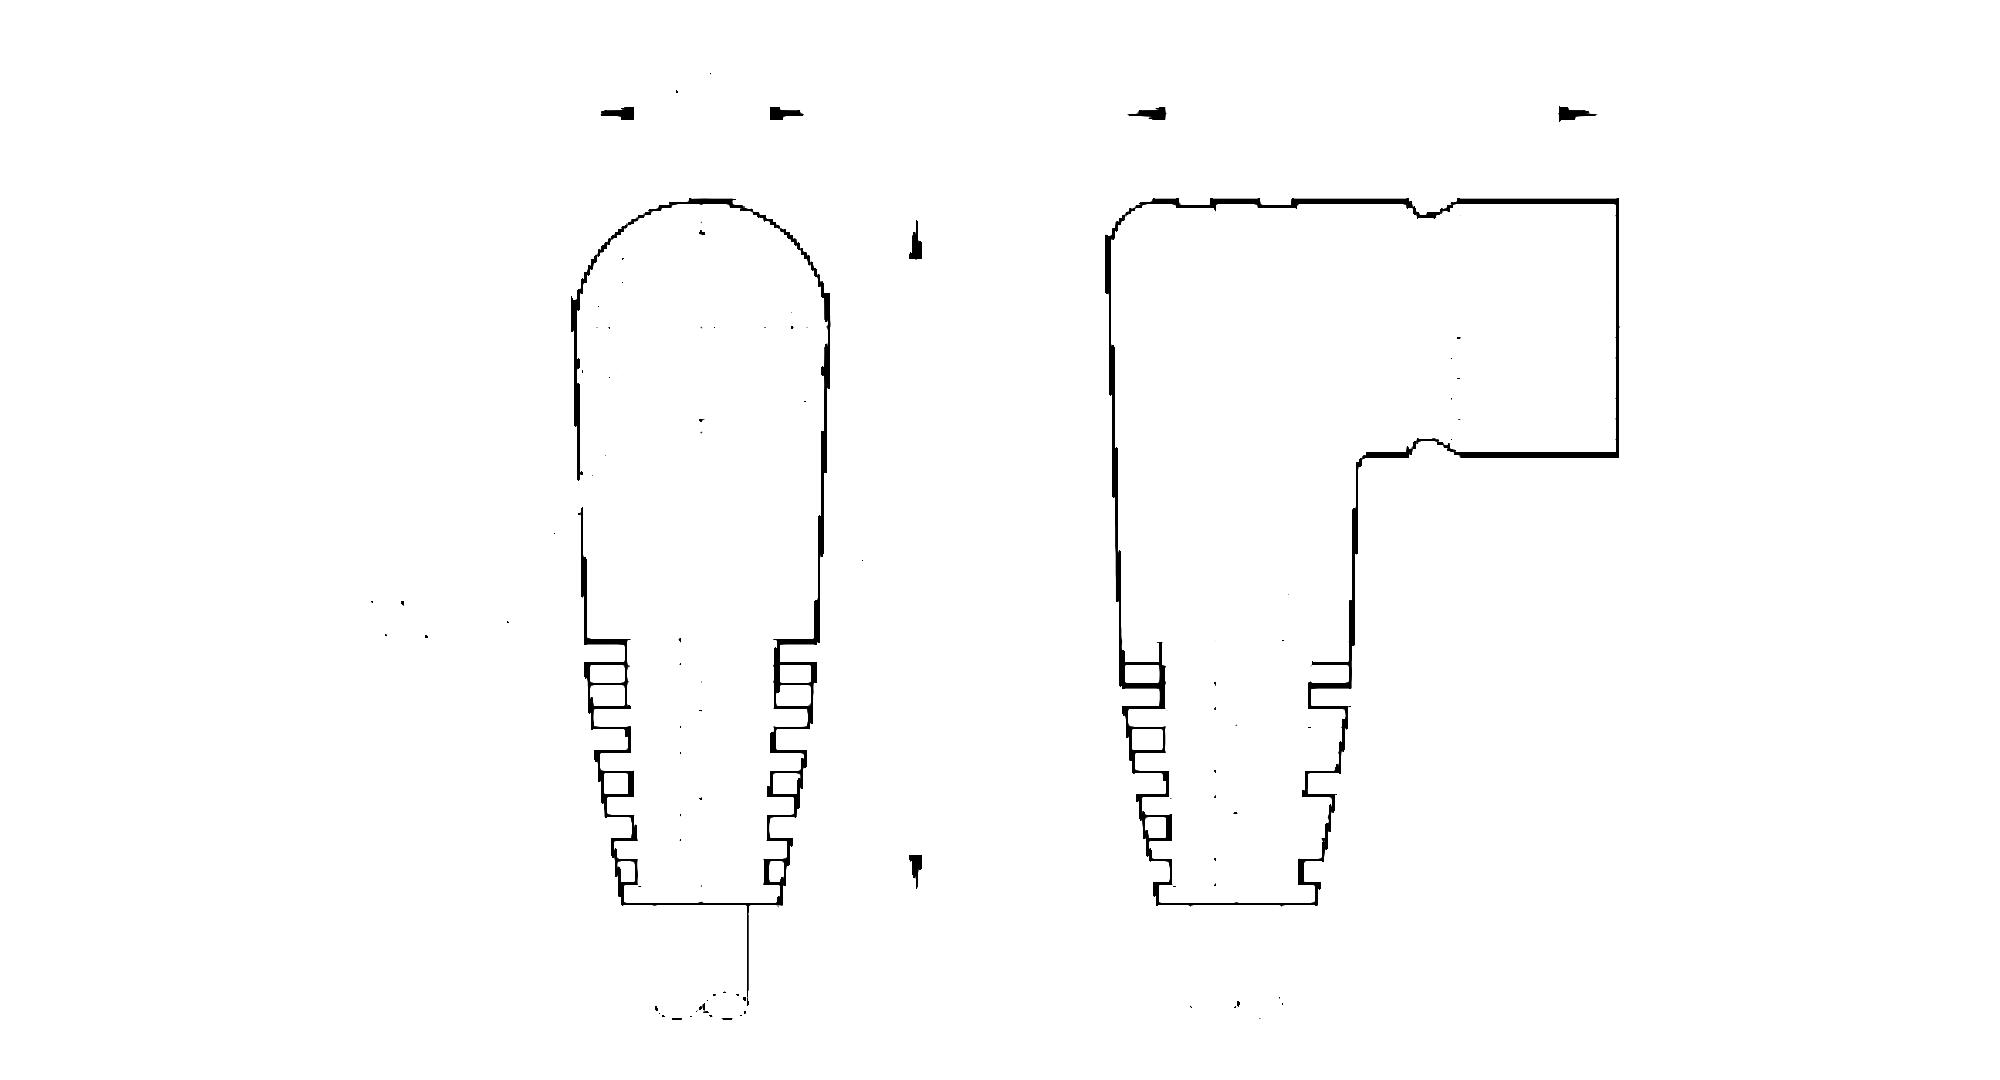 e11745 - female cordset